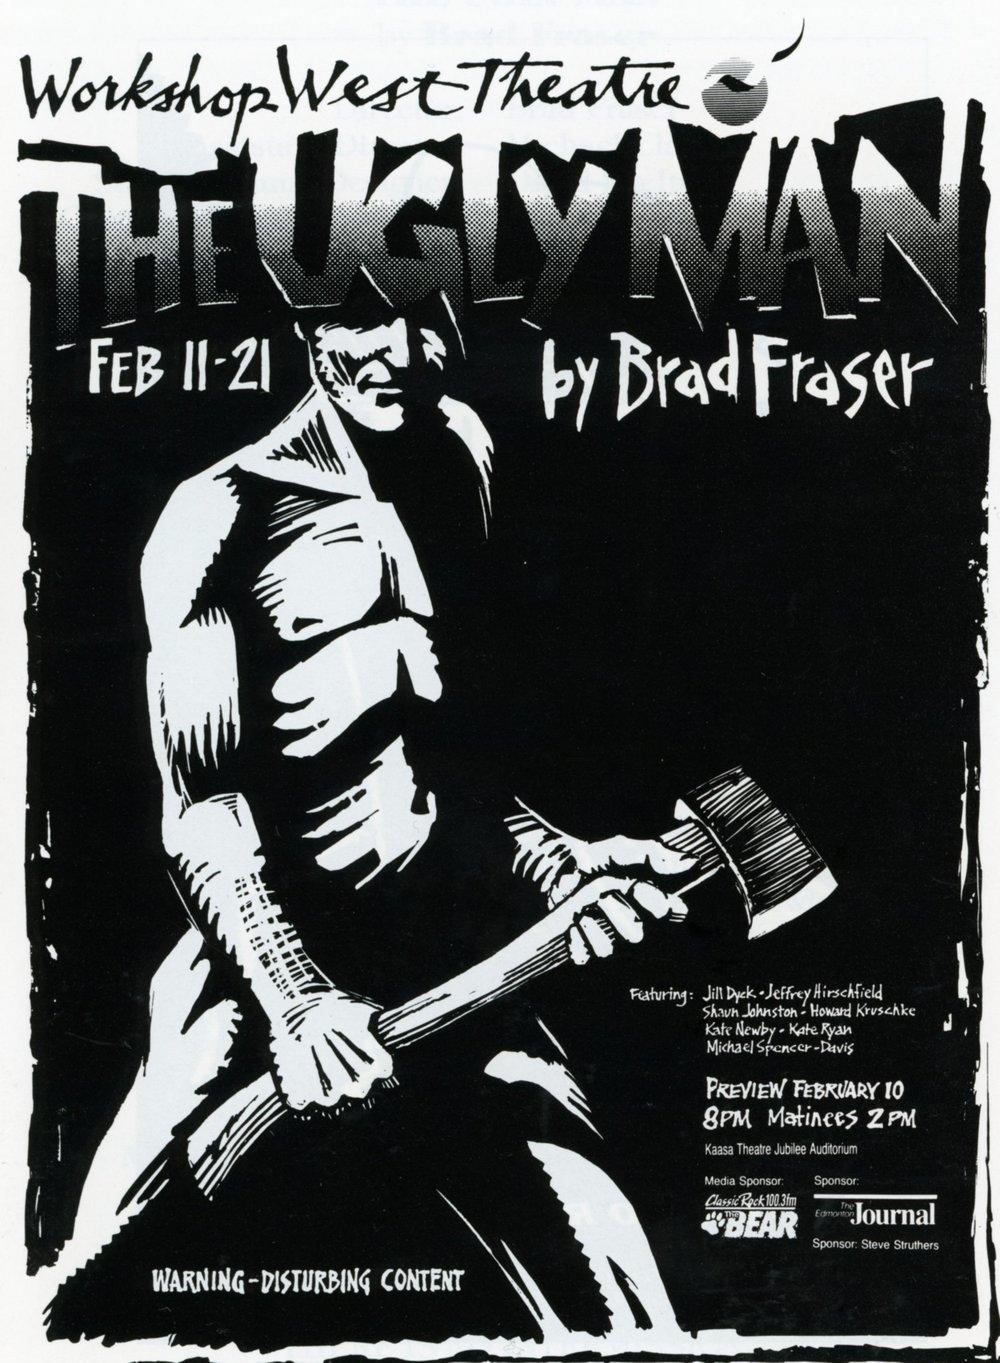 The Ugly Man (Febuary, 1993)-Program Cover JPEG.jpg